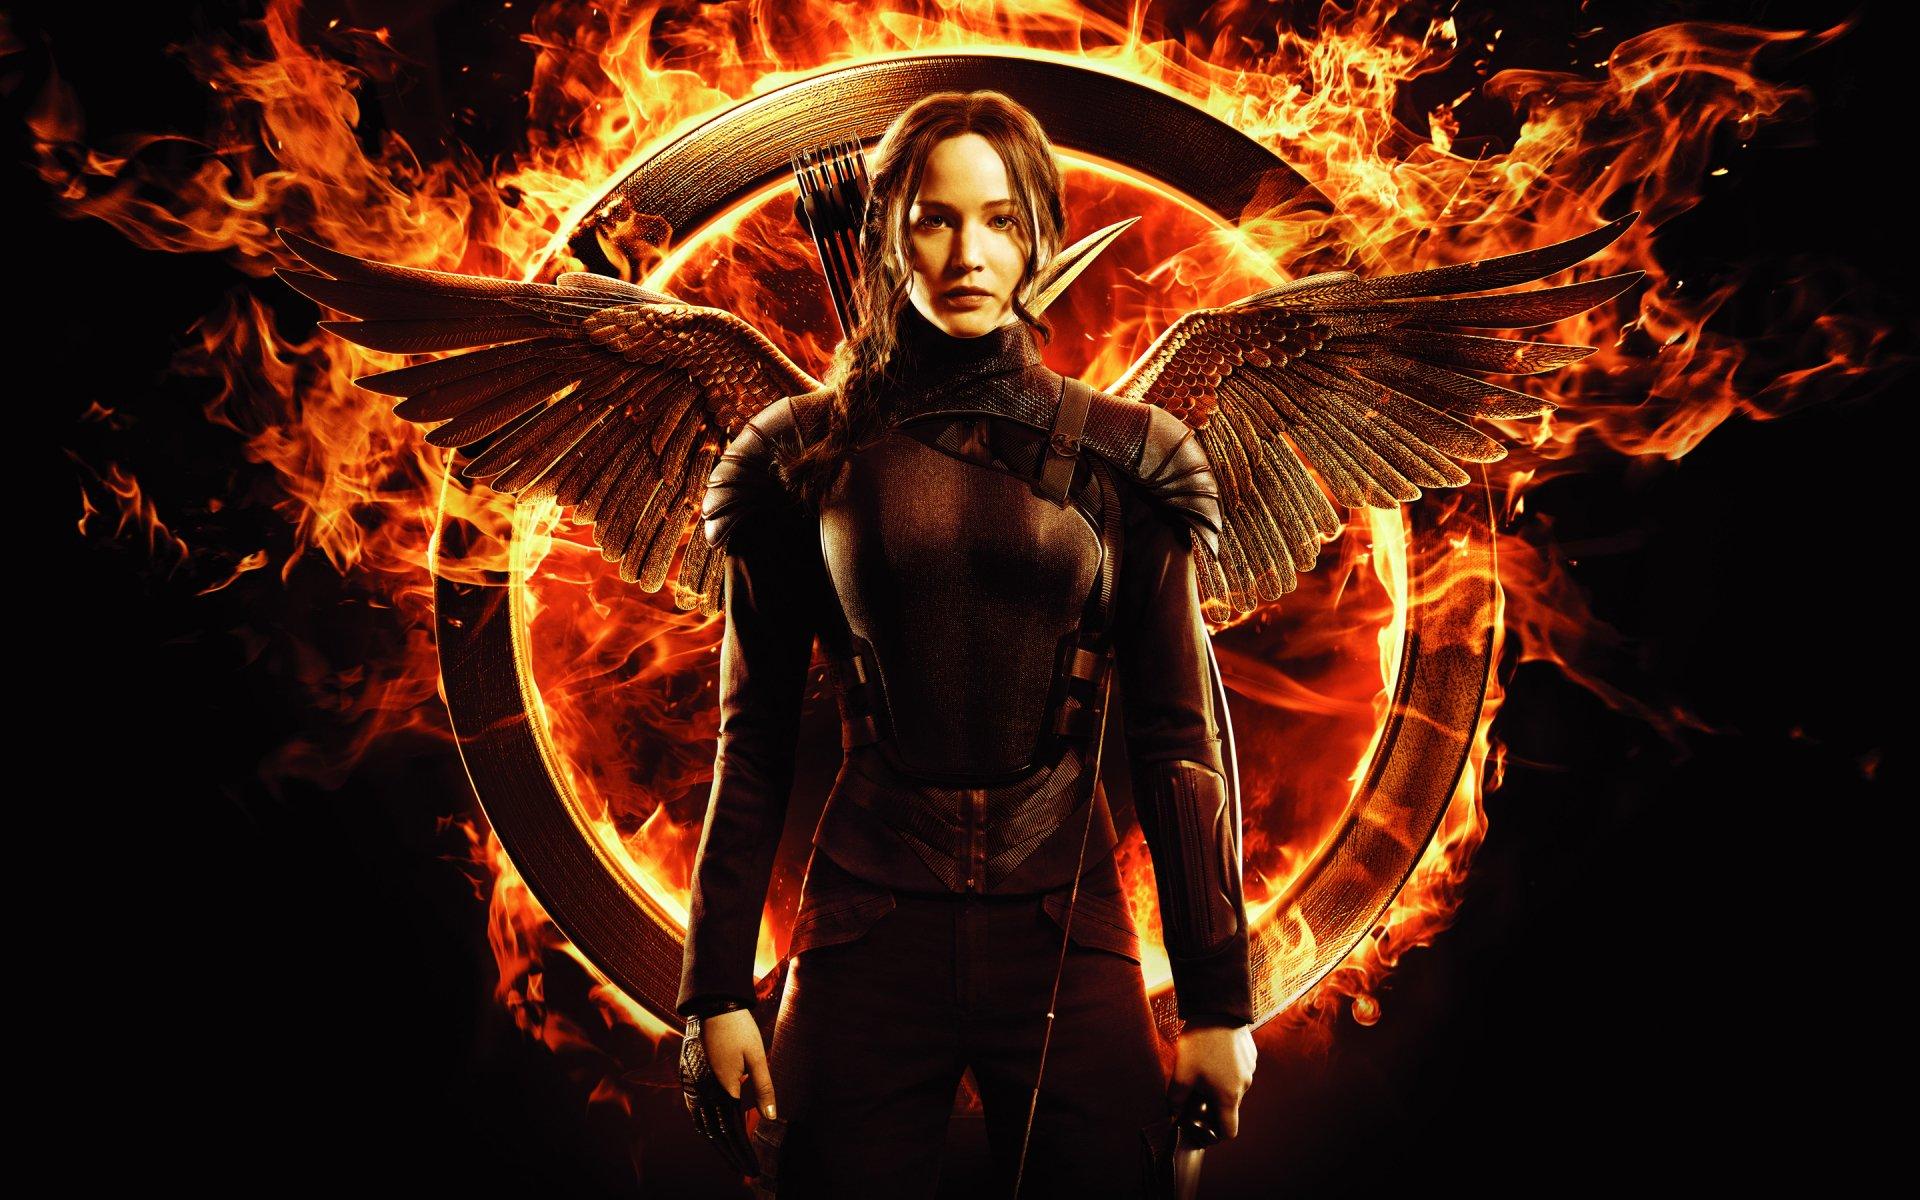 Movie - The Hunger Games: Mockingjay - Part 1  Jennifer Lawrence Fire Katniss Everdeen Wallpaper